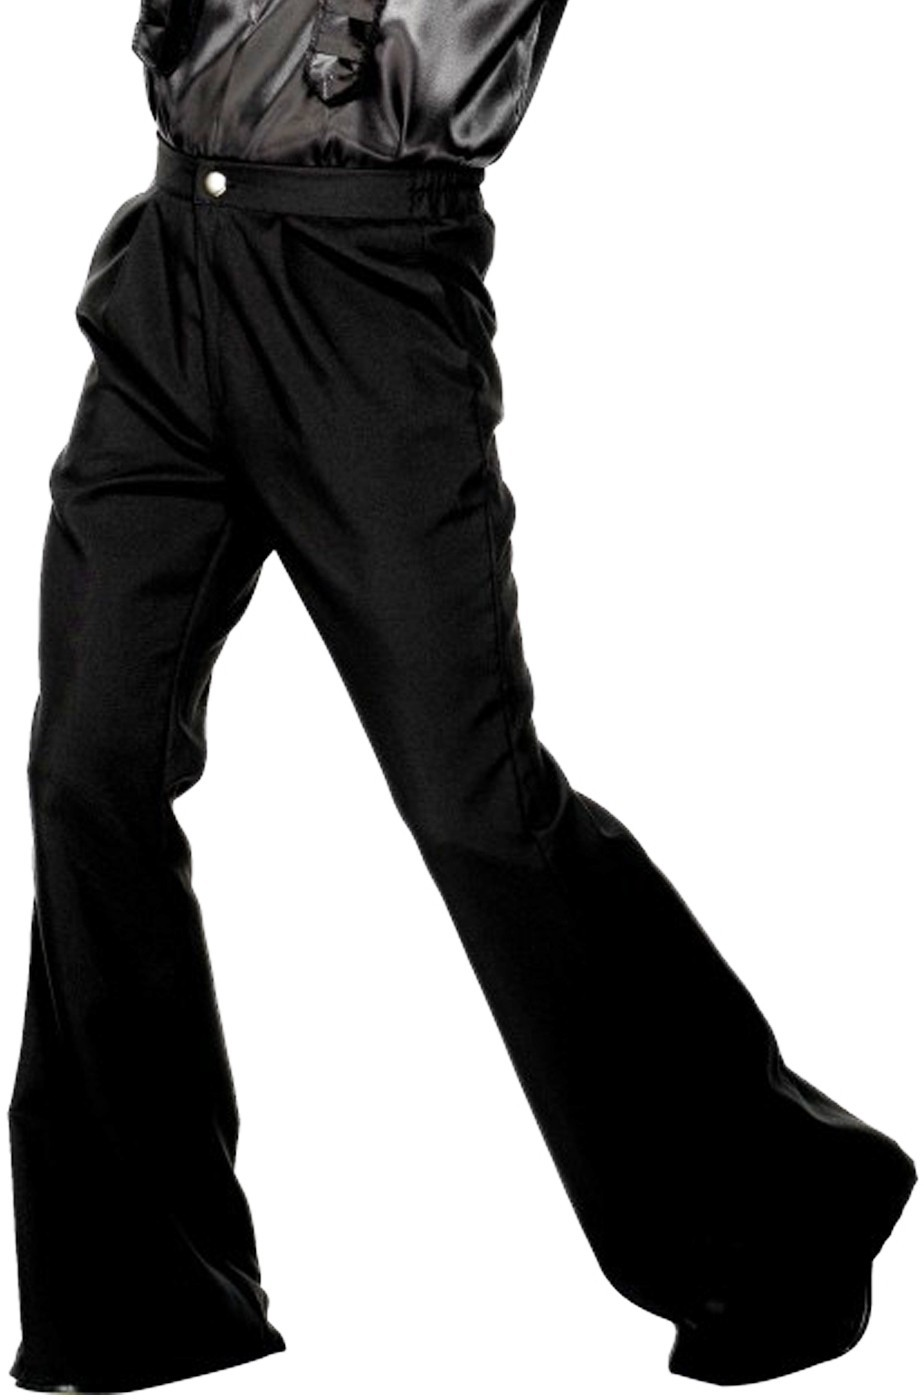 93eb566b65 Pantaloni anni 70 a zampa di elefante neri